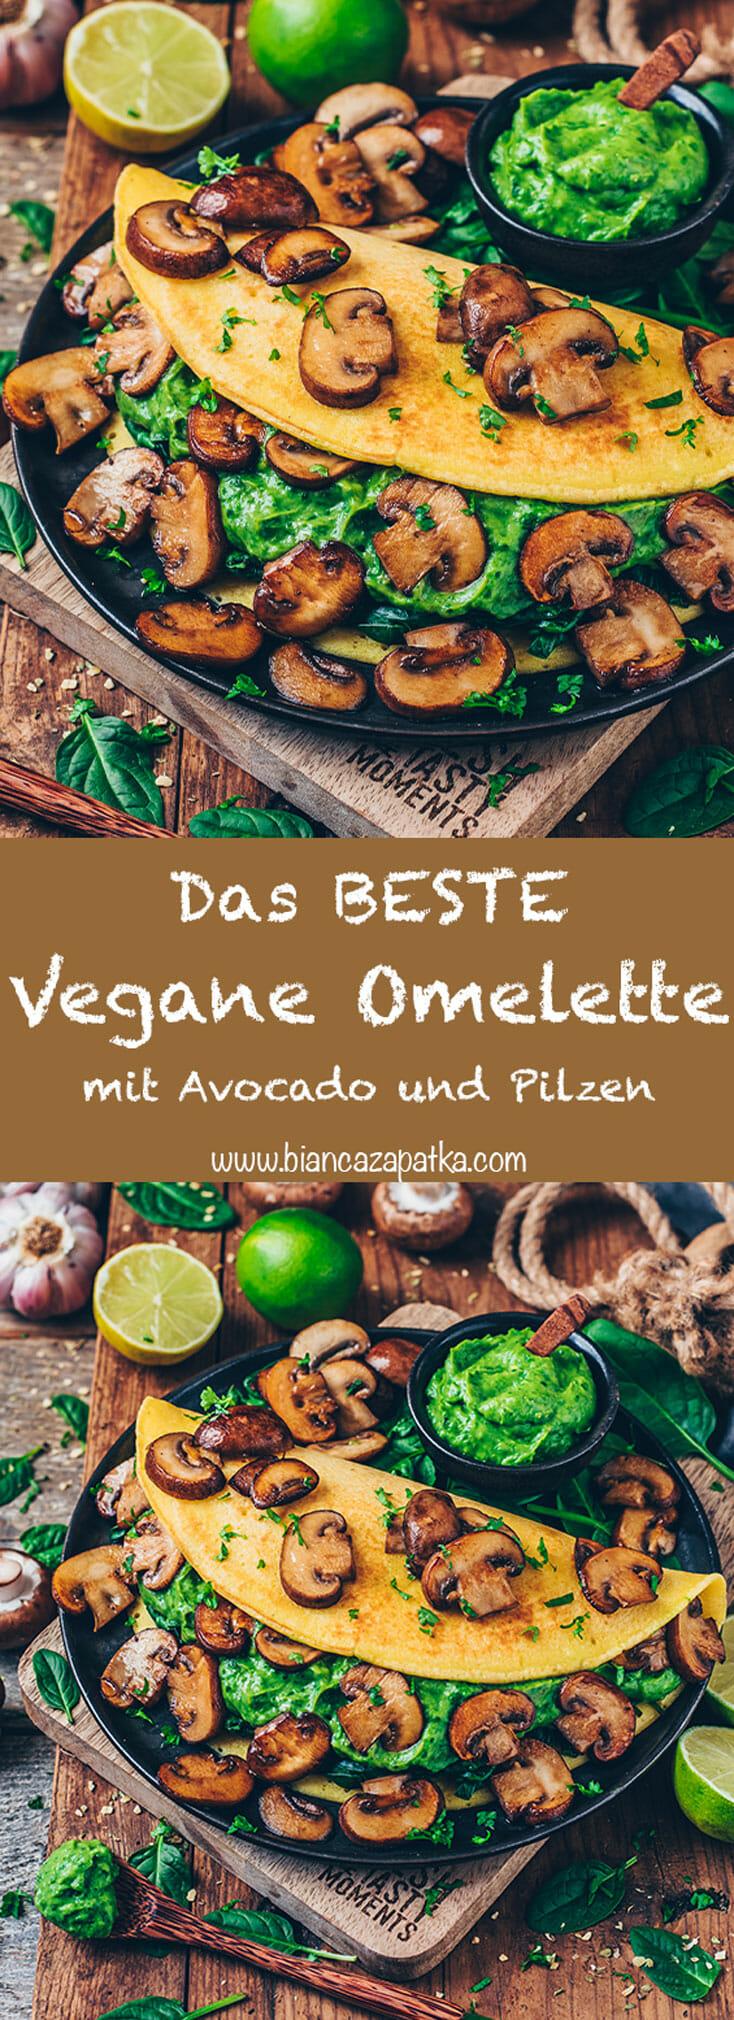 Veganes Omelette mit Avocado Guacamole und Pilzen